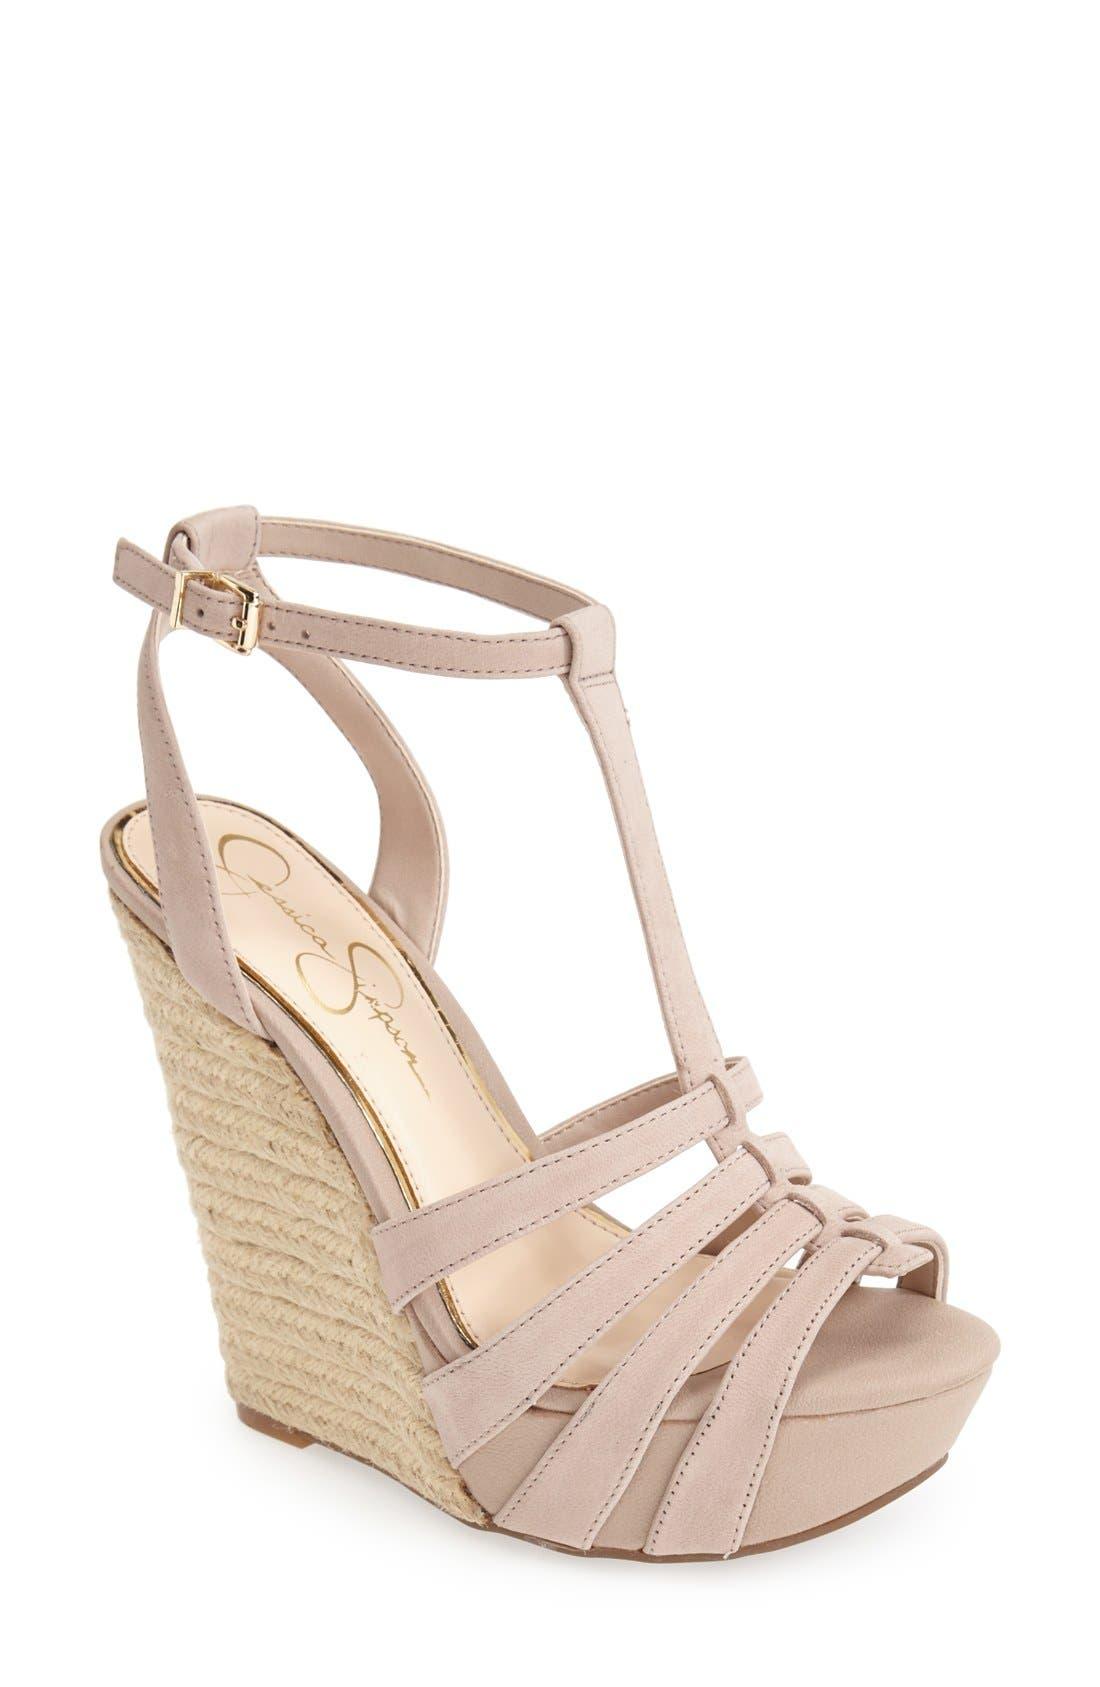 Main Image - Jessica Simpson 'Bristol' Ankle Strap Platform Wedge Sandal (Women)